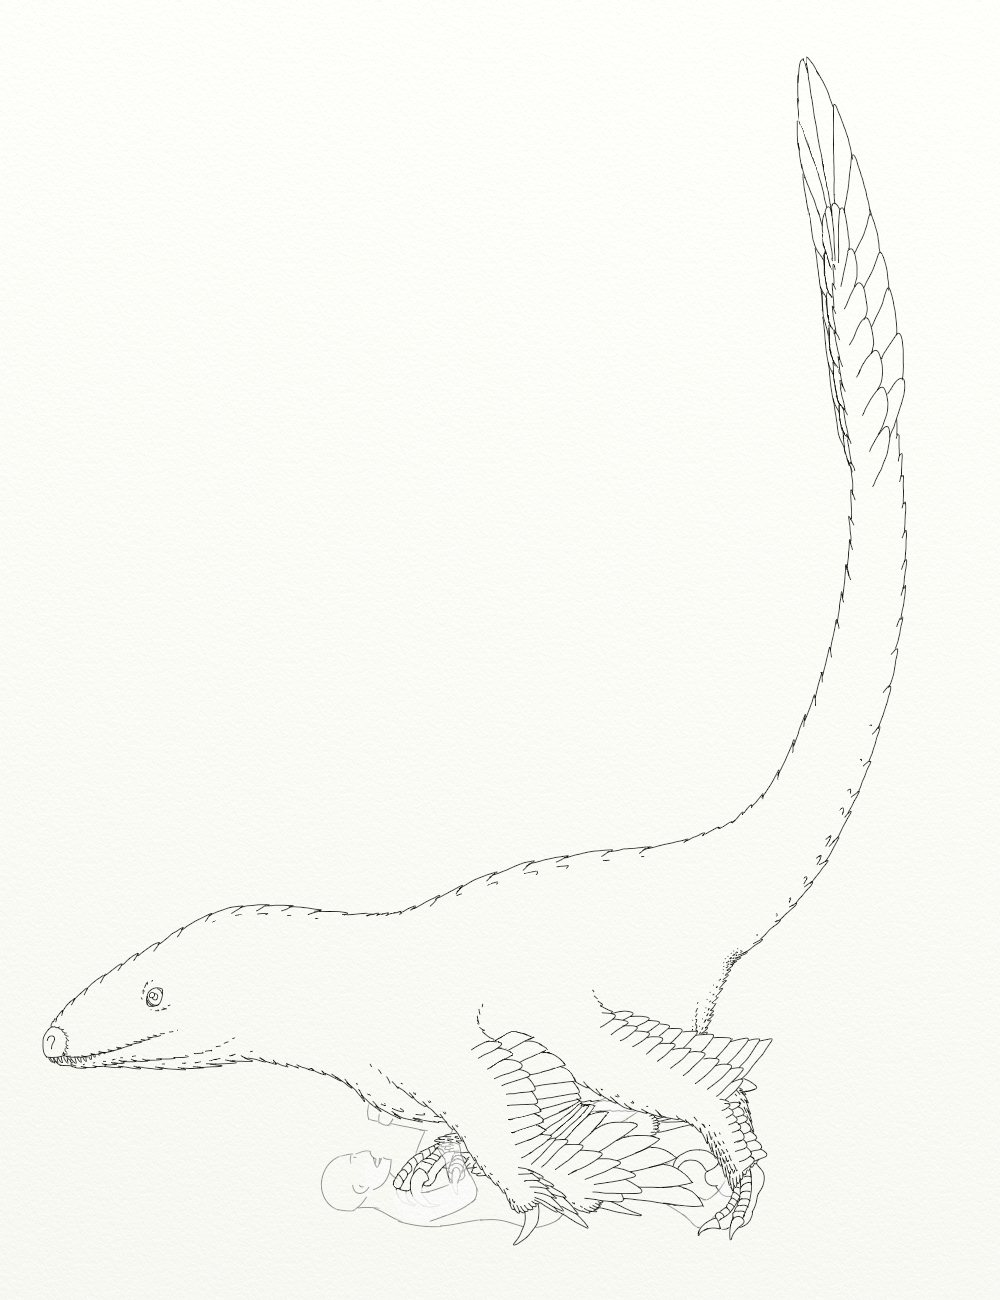 Upset with utahraptor by dracontes on deviantart for Utahraptor coloring page